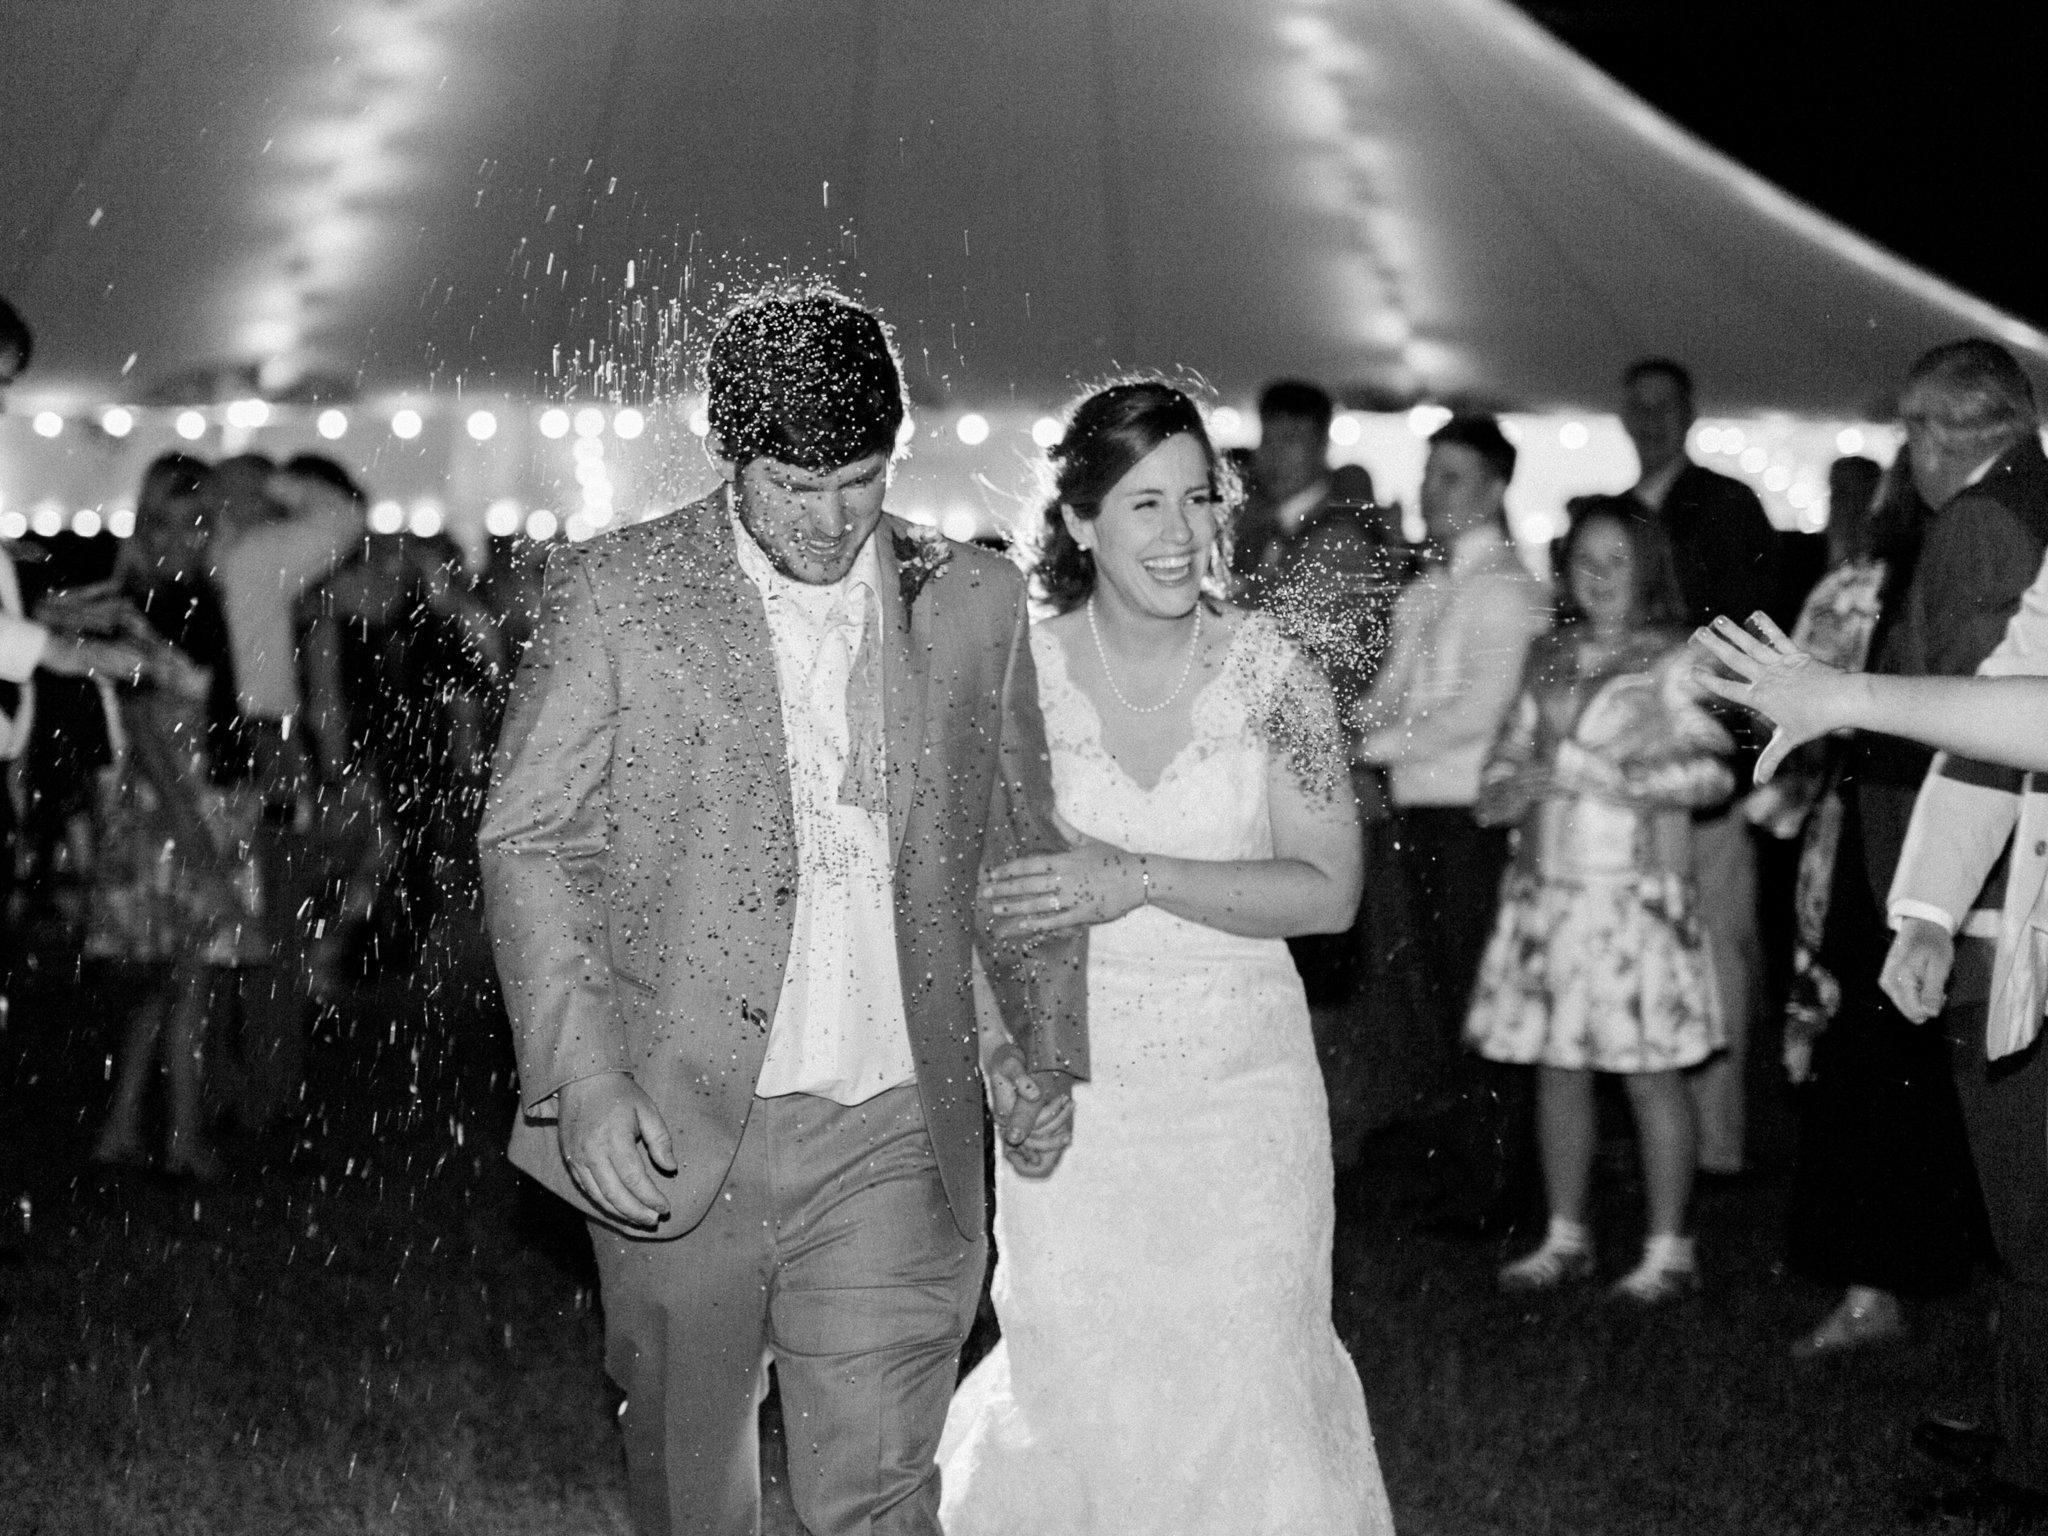 ecila farm wedding albany georgia wedding photographer shannon griffin photography-13.jpg